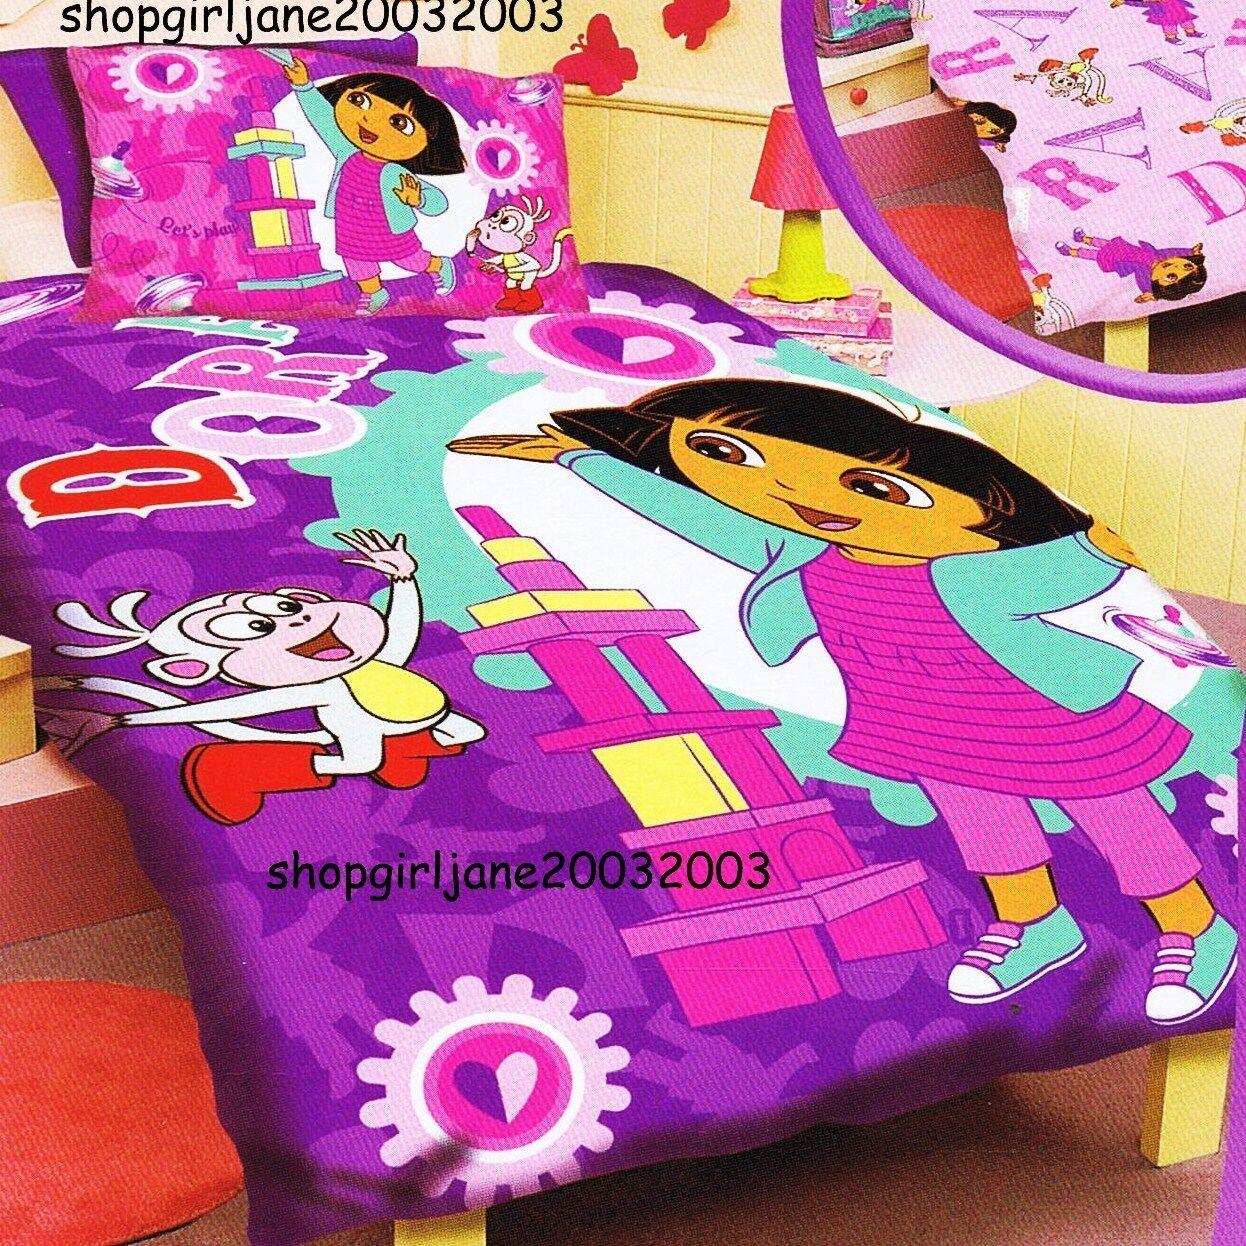 Dora the Explorer - Let's Play - Double US Full Bed Quilt Doona Duvet Cover Set